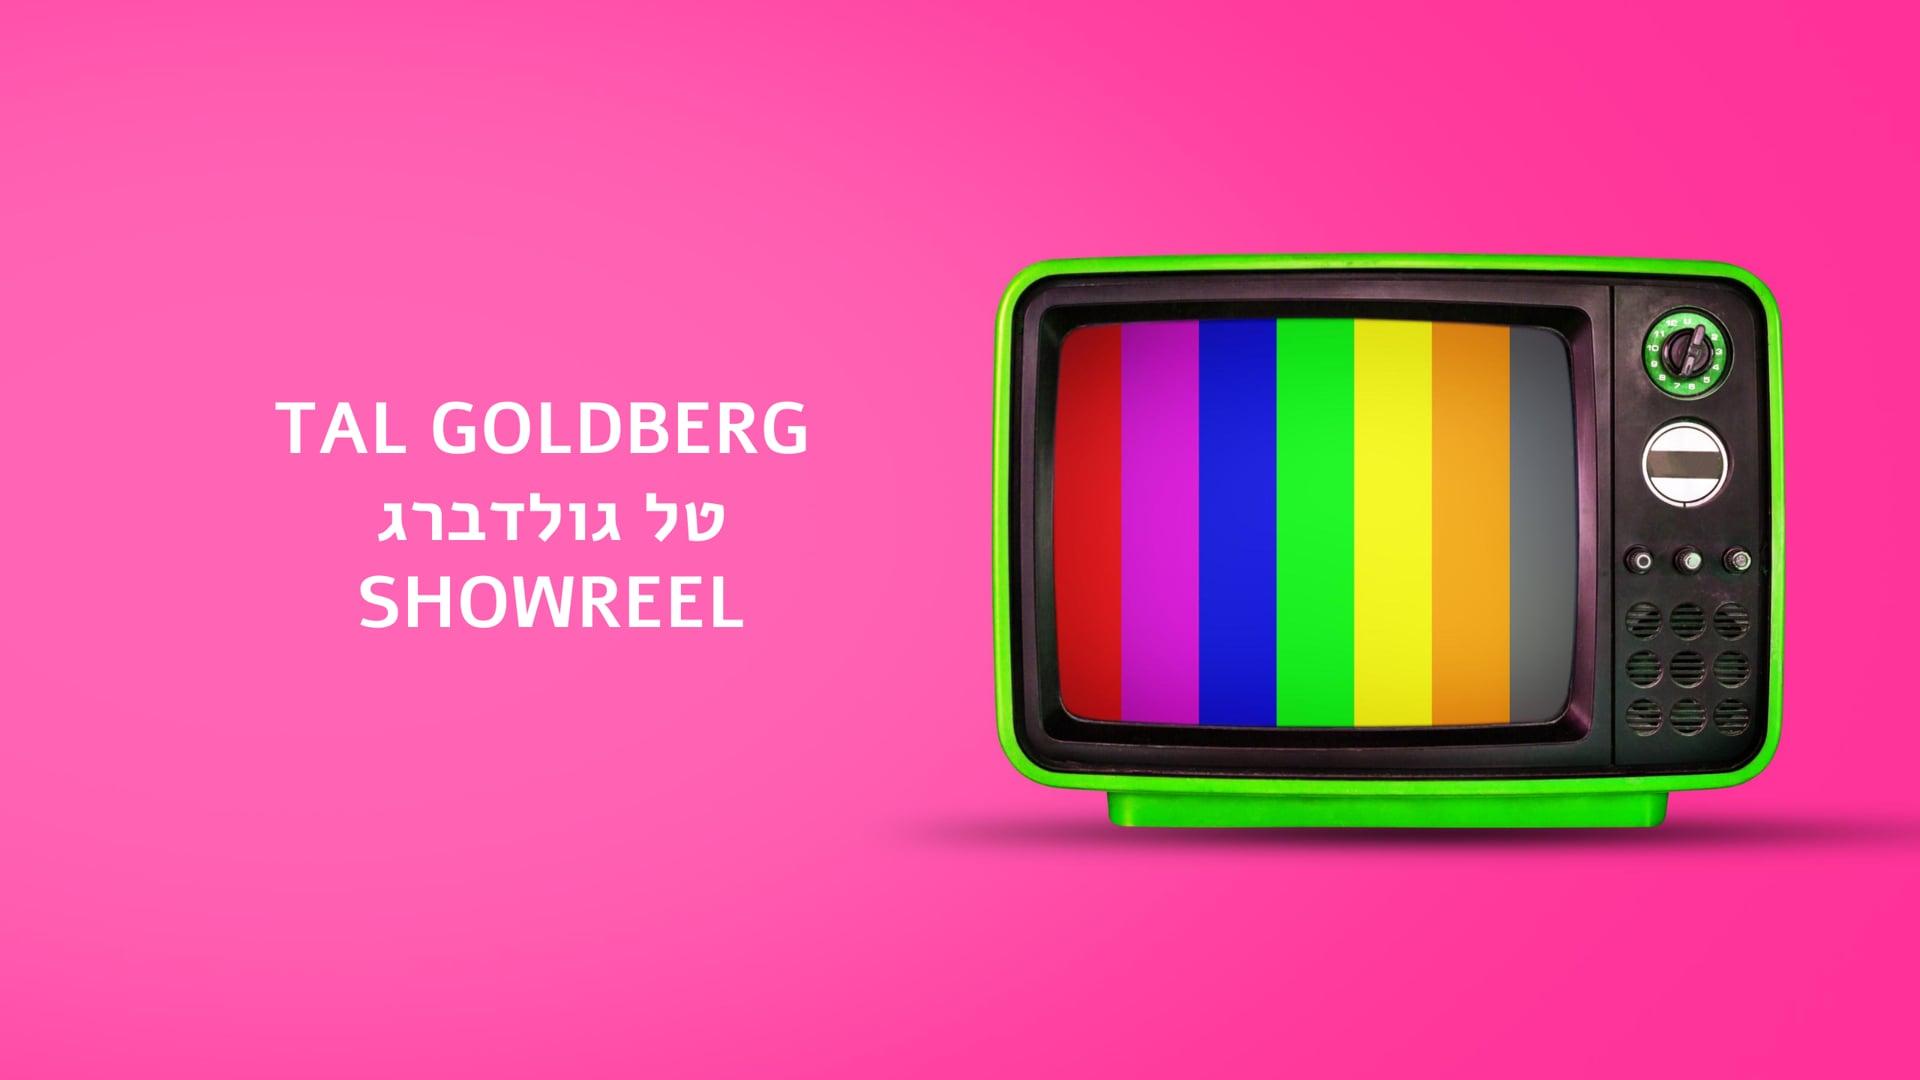 Screenwriting, Directing, Editing - Showreel 2020 - במאי תסריטאי, עריכת וידאו